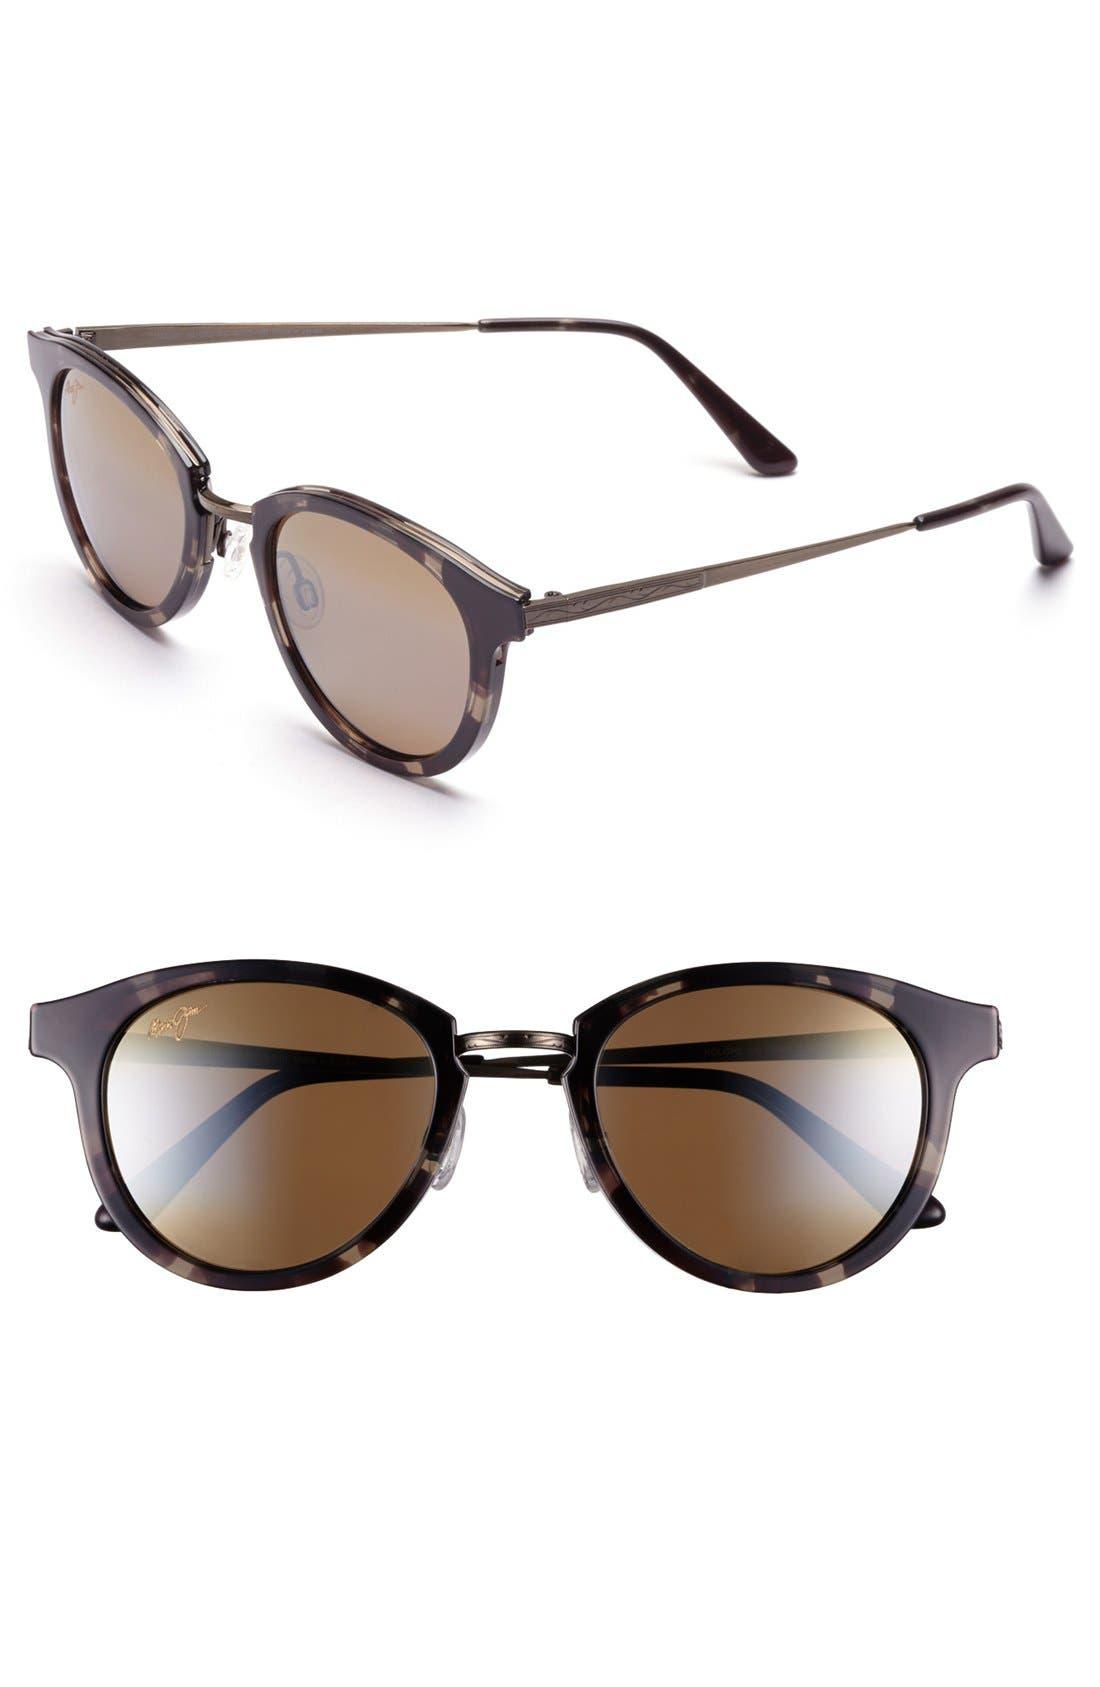 Alternate Image 1 Selected - Maui Jim 'Kolohe' 50mm Polarized Sunglasses